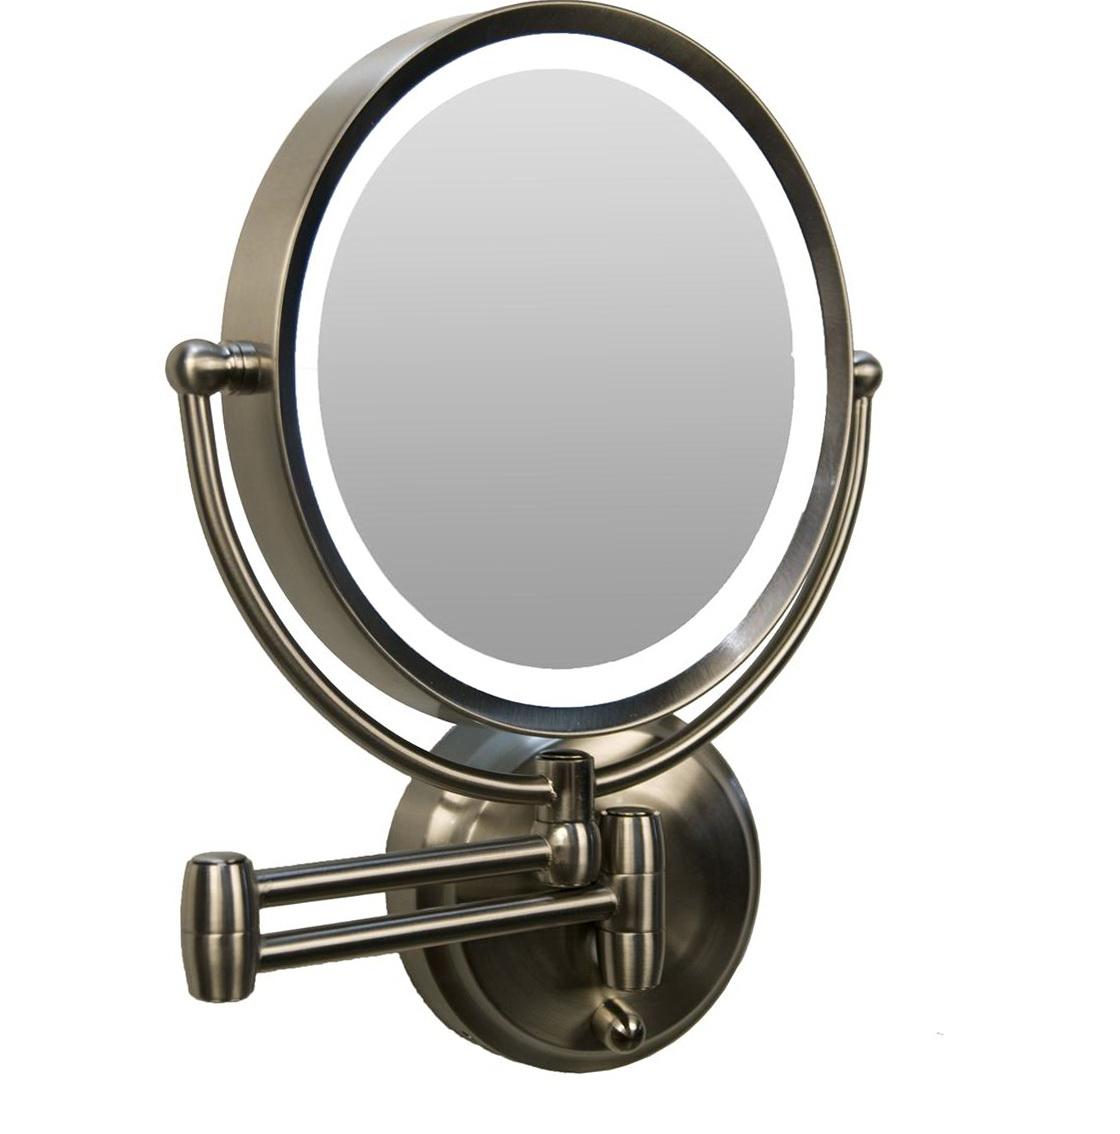 Lighted makeup mirror wall mount bronze home design ideas for Wall mounted makeup mirror